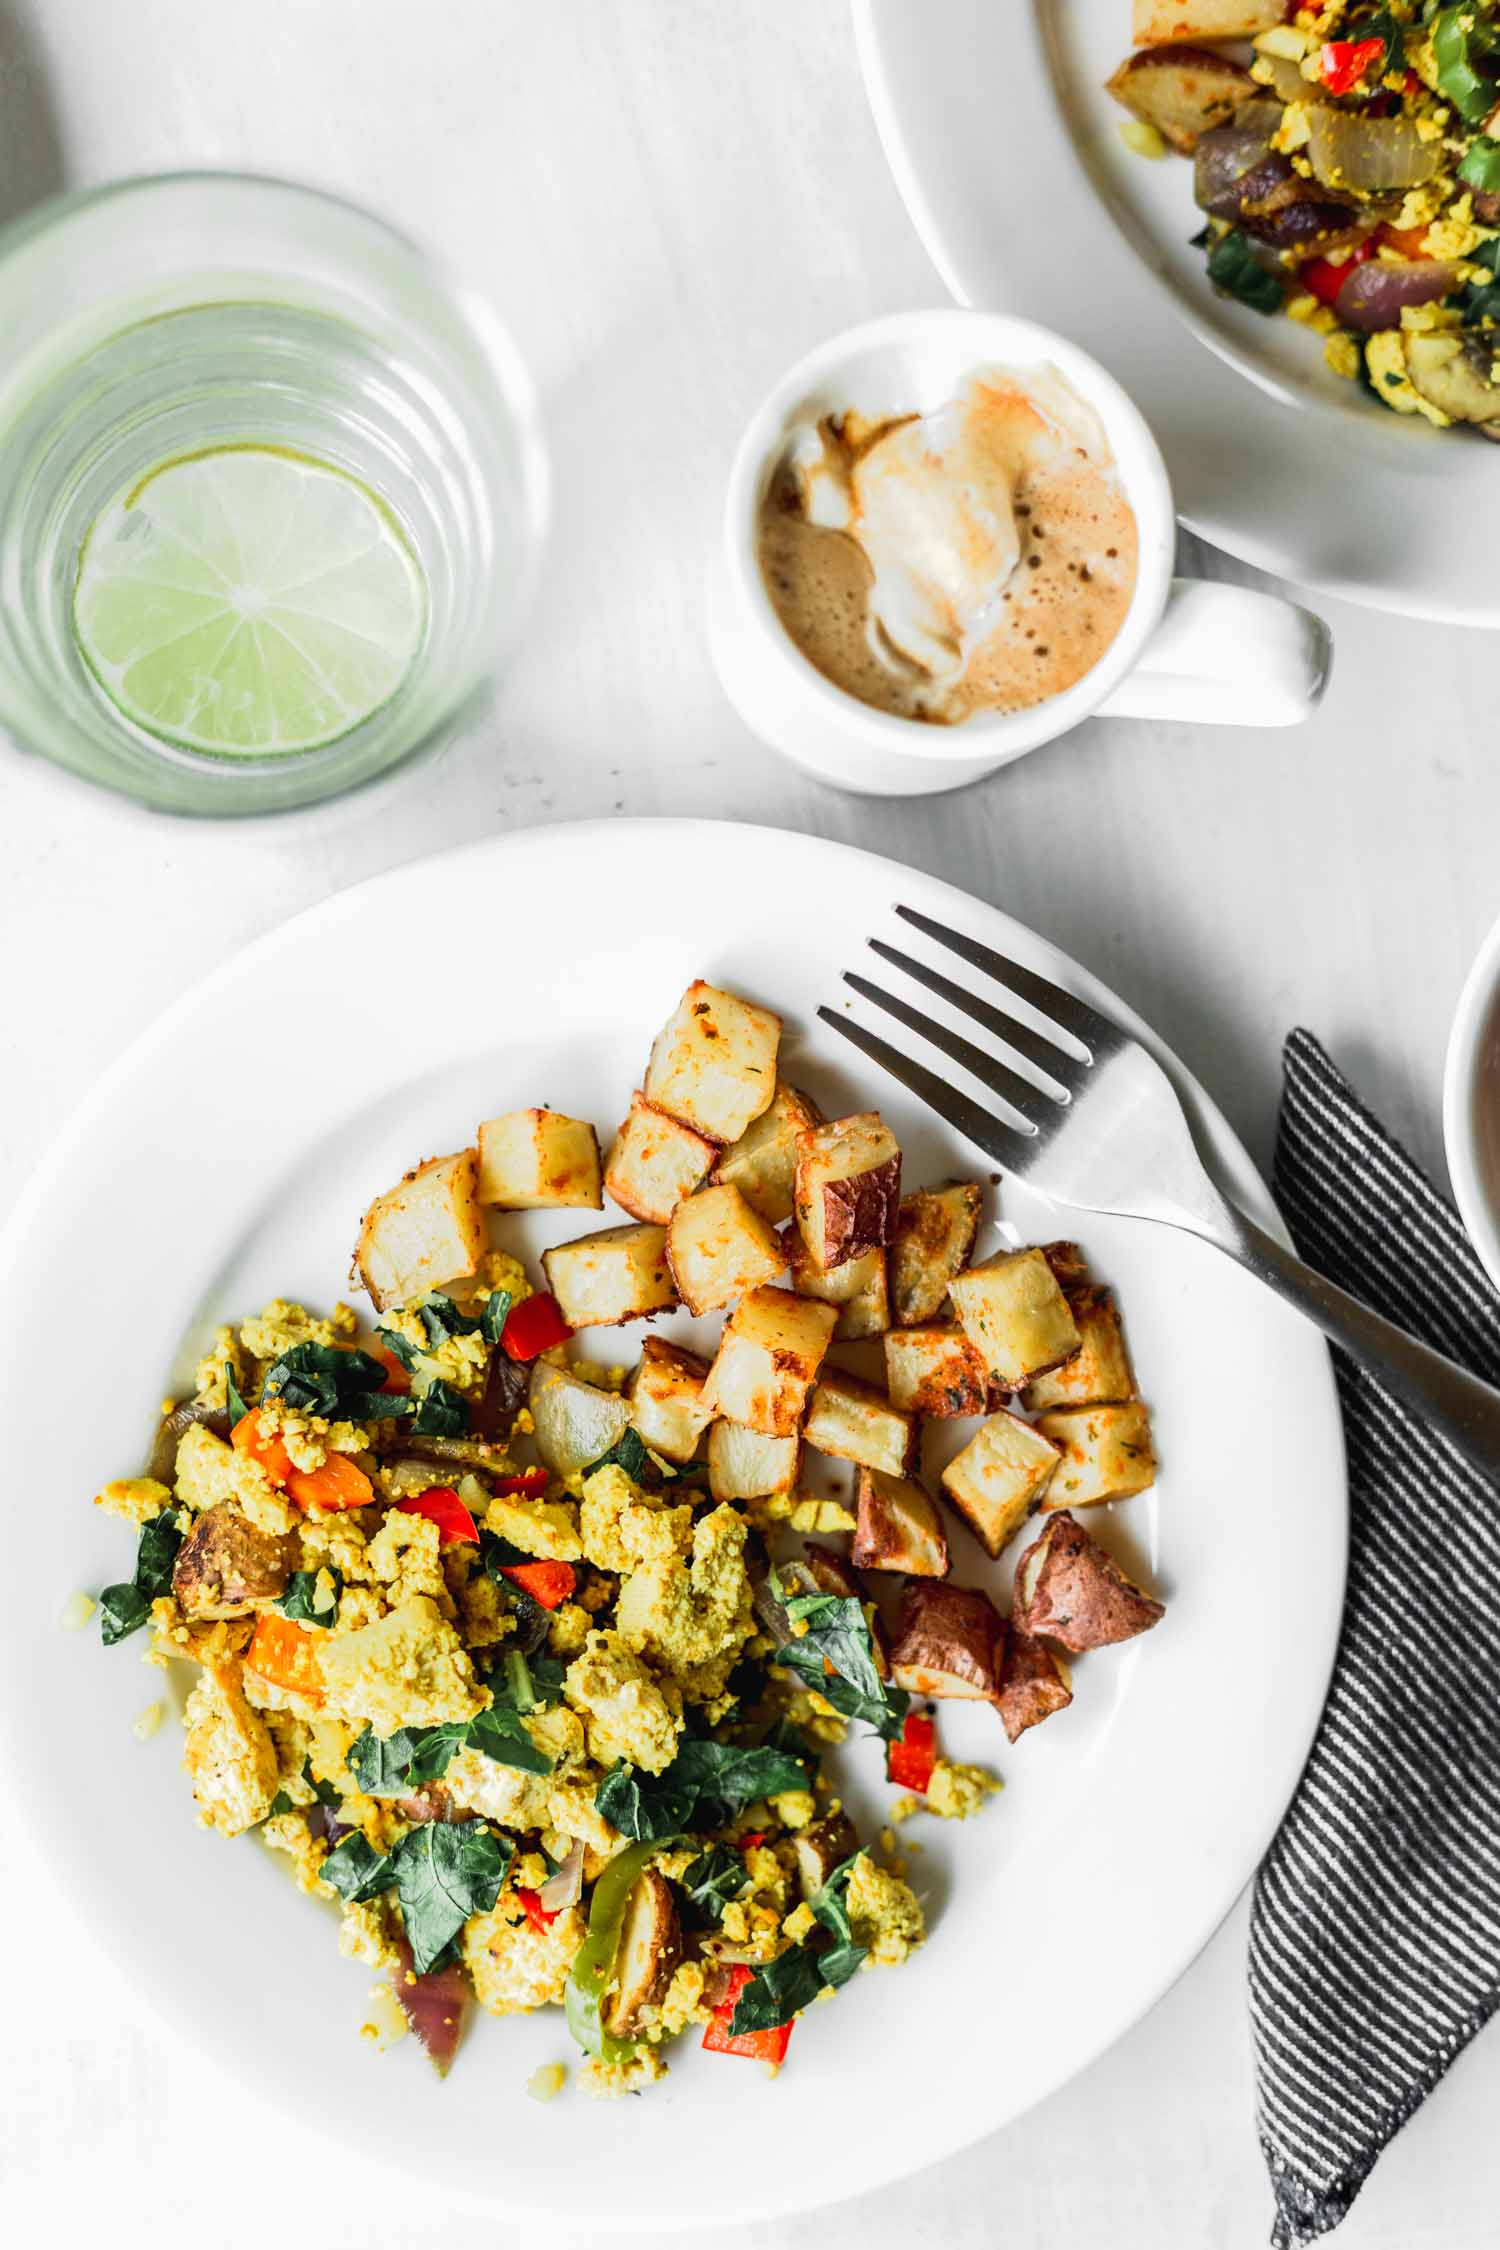 Veggie-Packed Scrambled Tofu recipe & photo by Beautiful Ingredient. vegan | gluten-free | oil-free | easy | veggie-packed | 30 minutes or less | breakfast